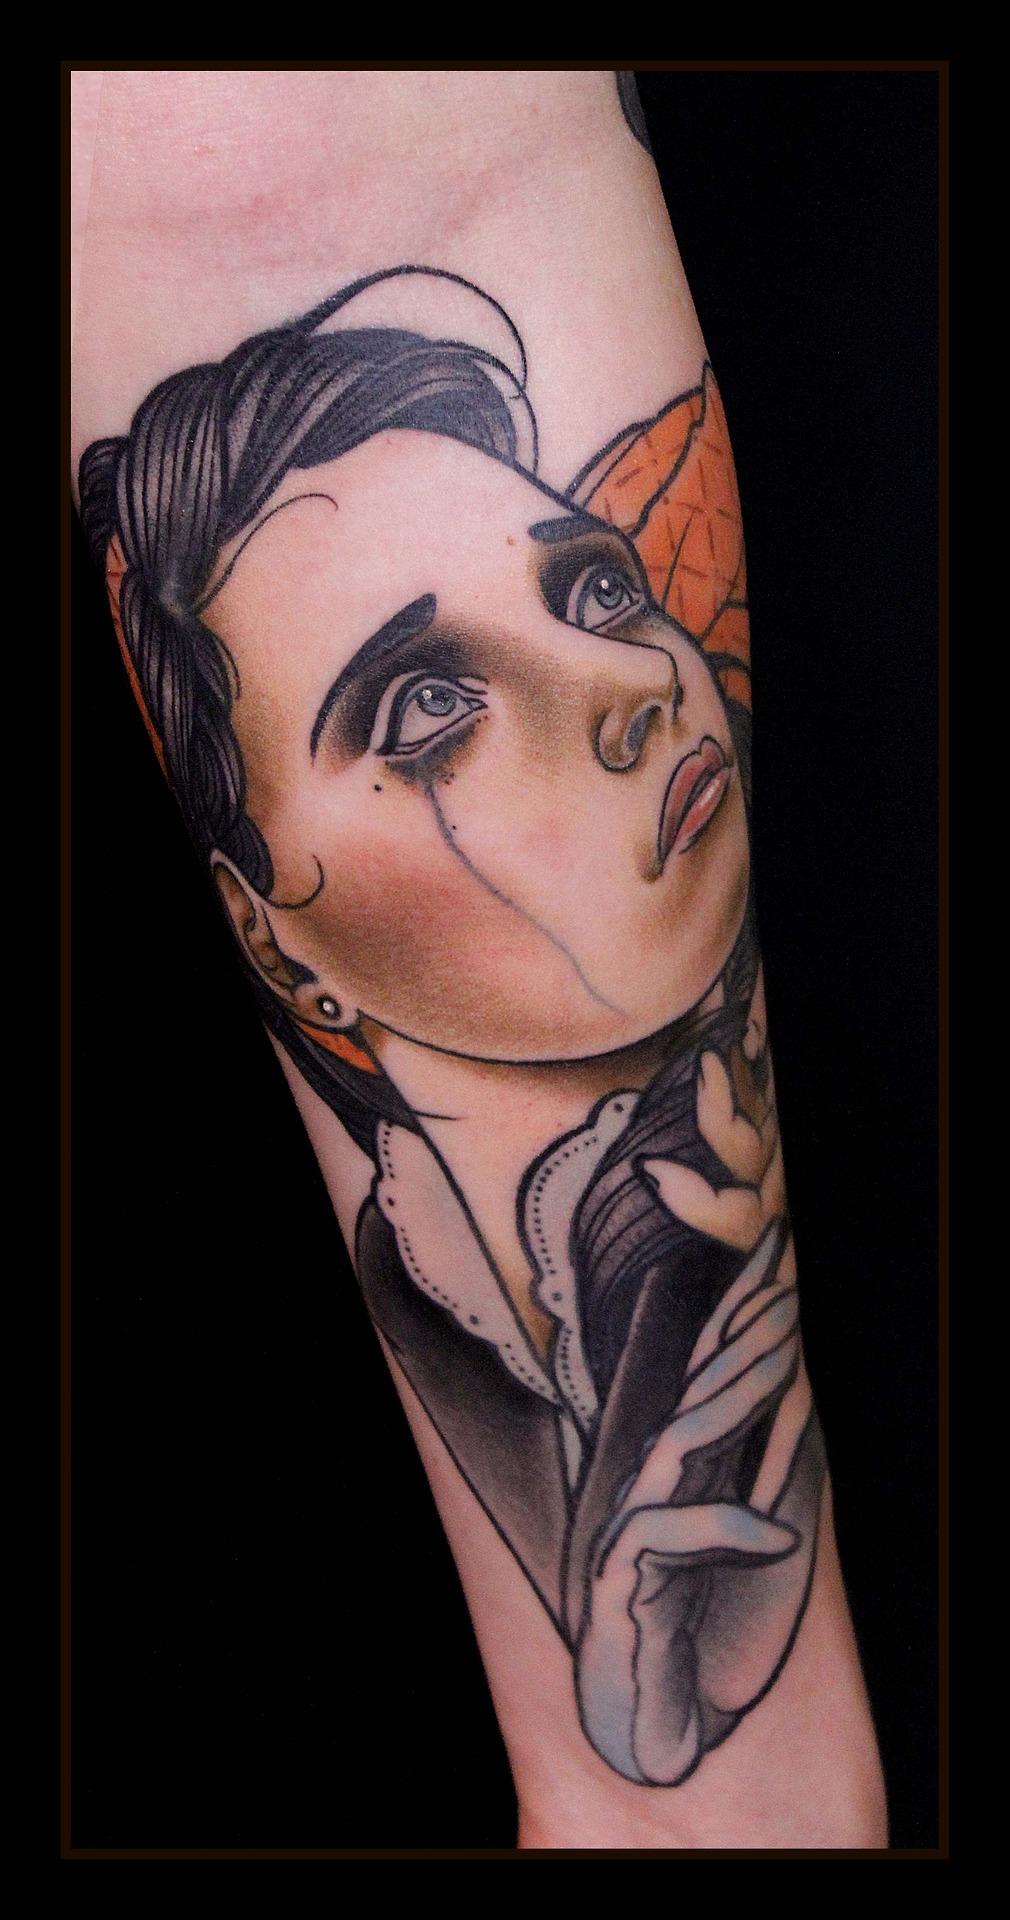 Crying-woman-tattoo.jpg